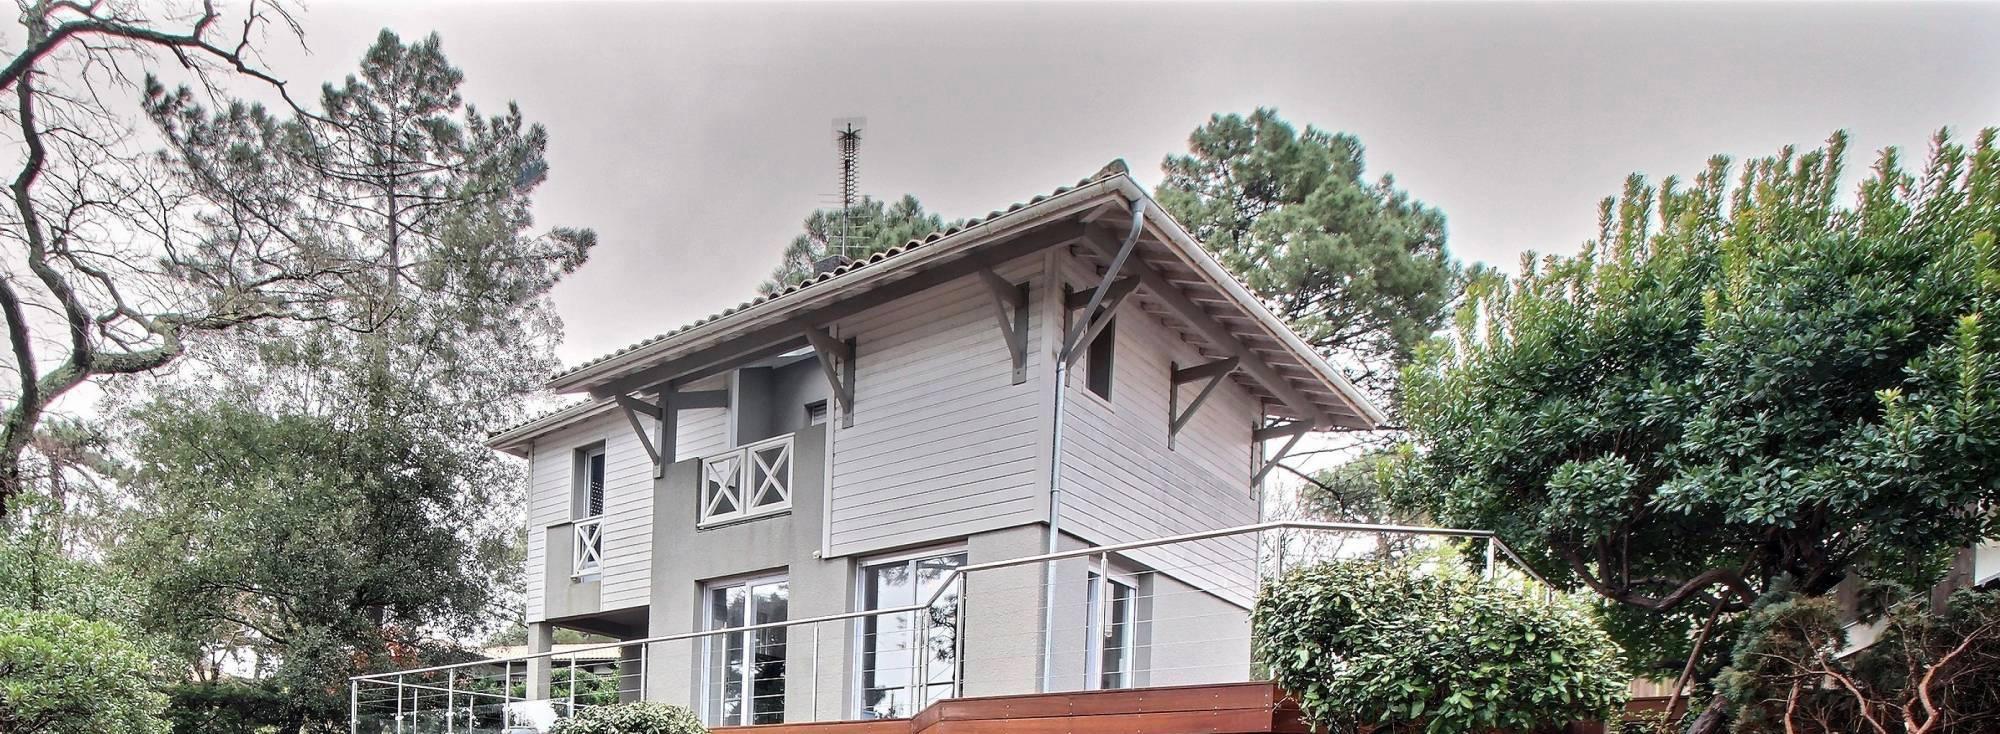 Location villa de standing PYLA SUR MER - 4 chambres - 8 personnes